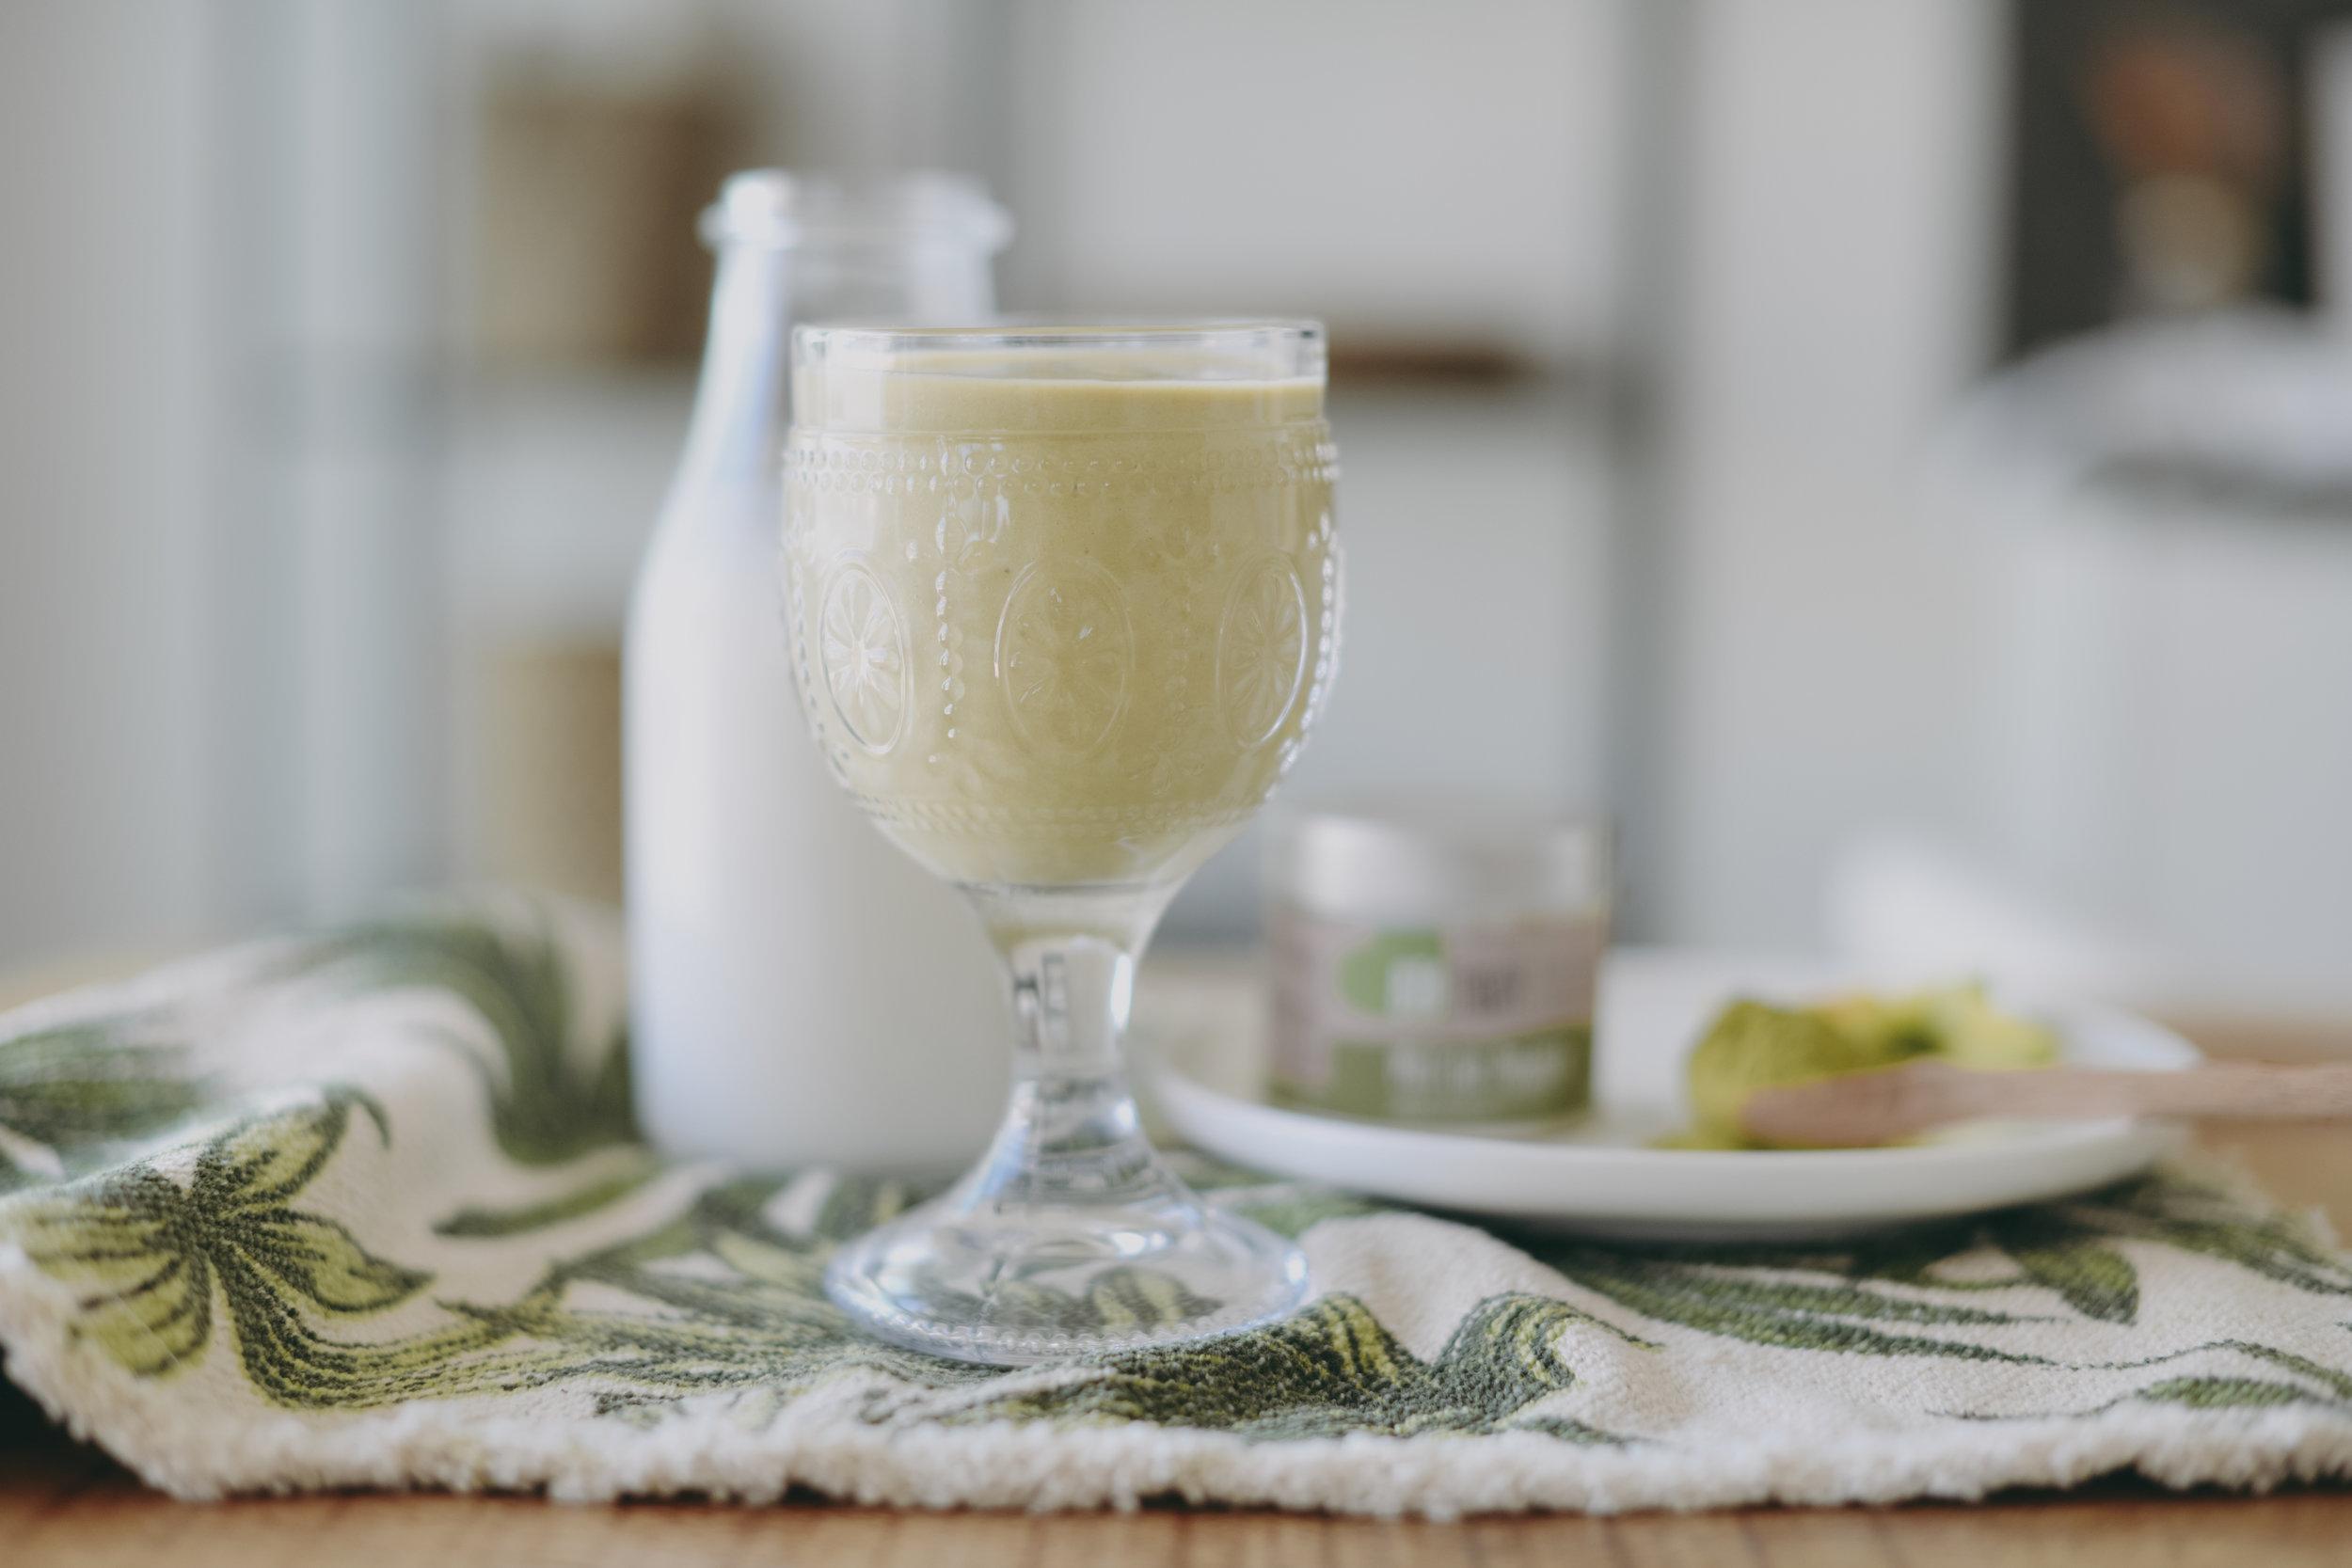 Avocado-smoothie.JPG